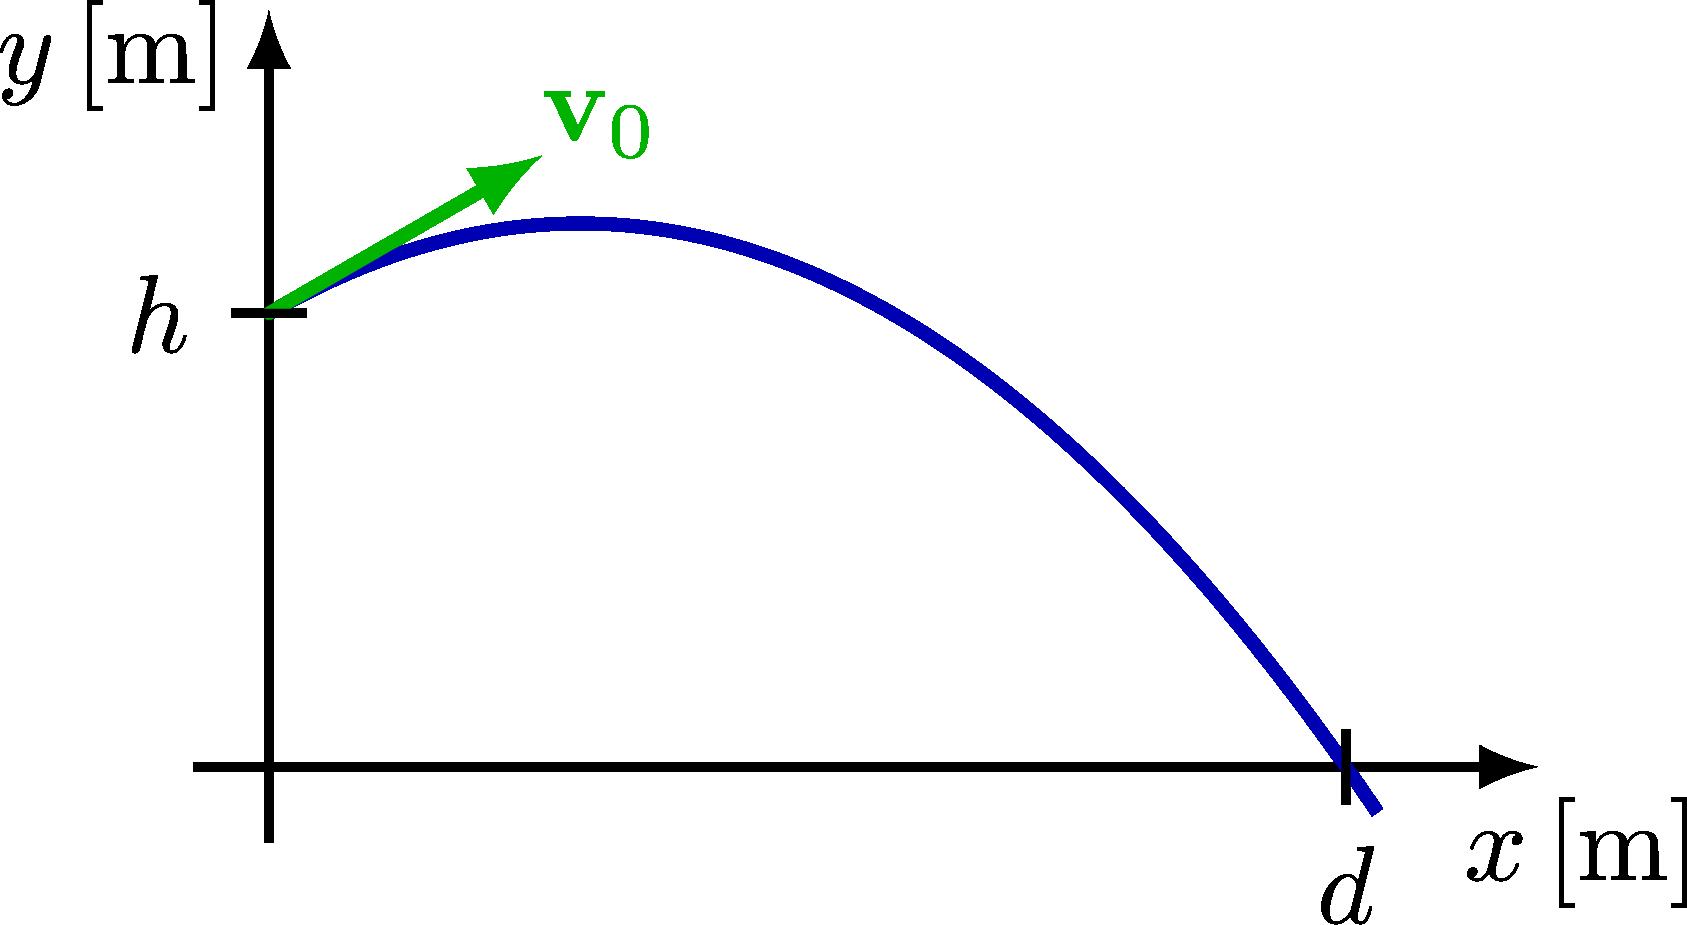 kinematics_trajectory2-001.png